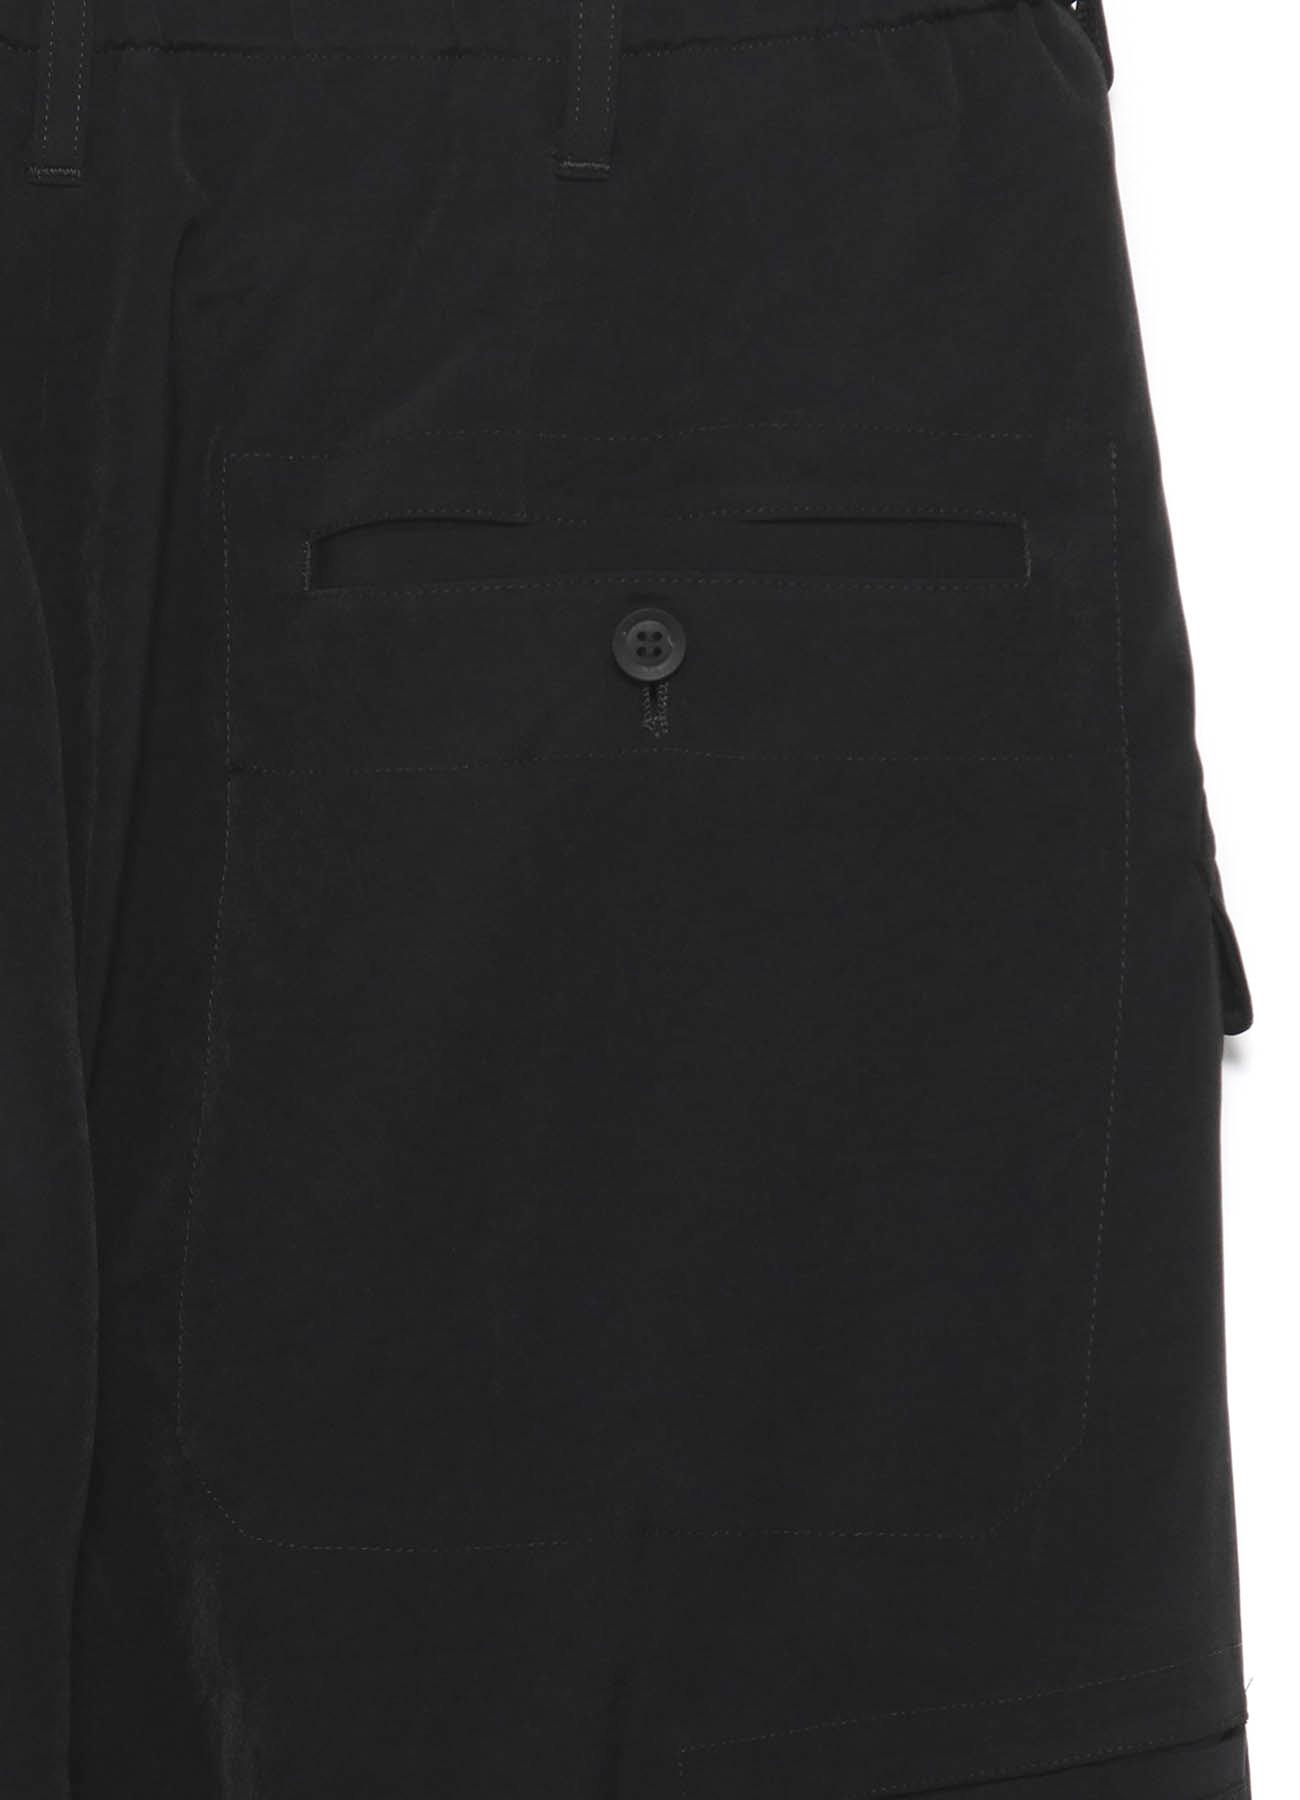 B/Decine Flap Pocket Pants